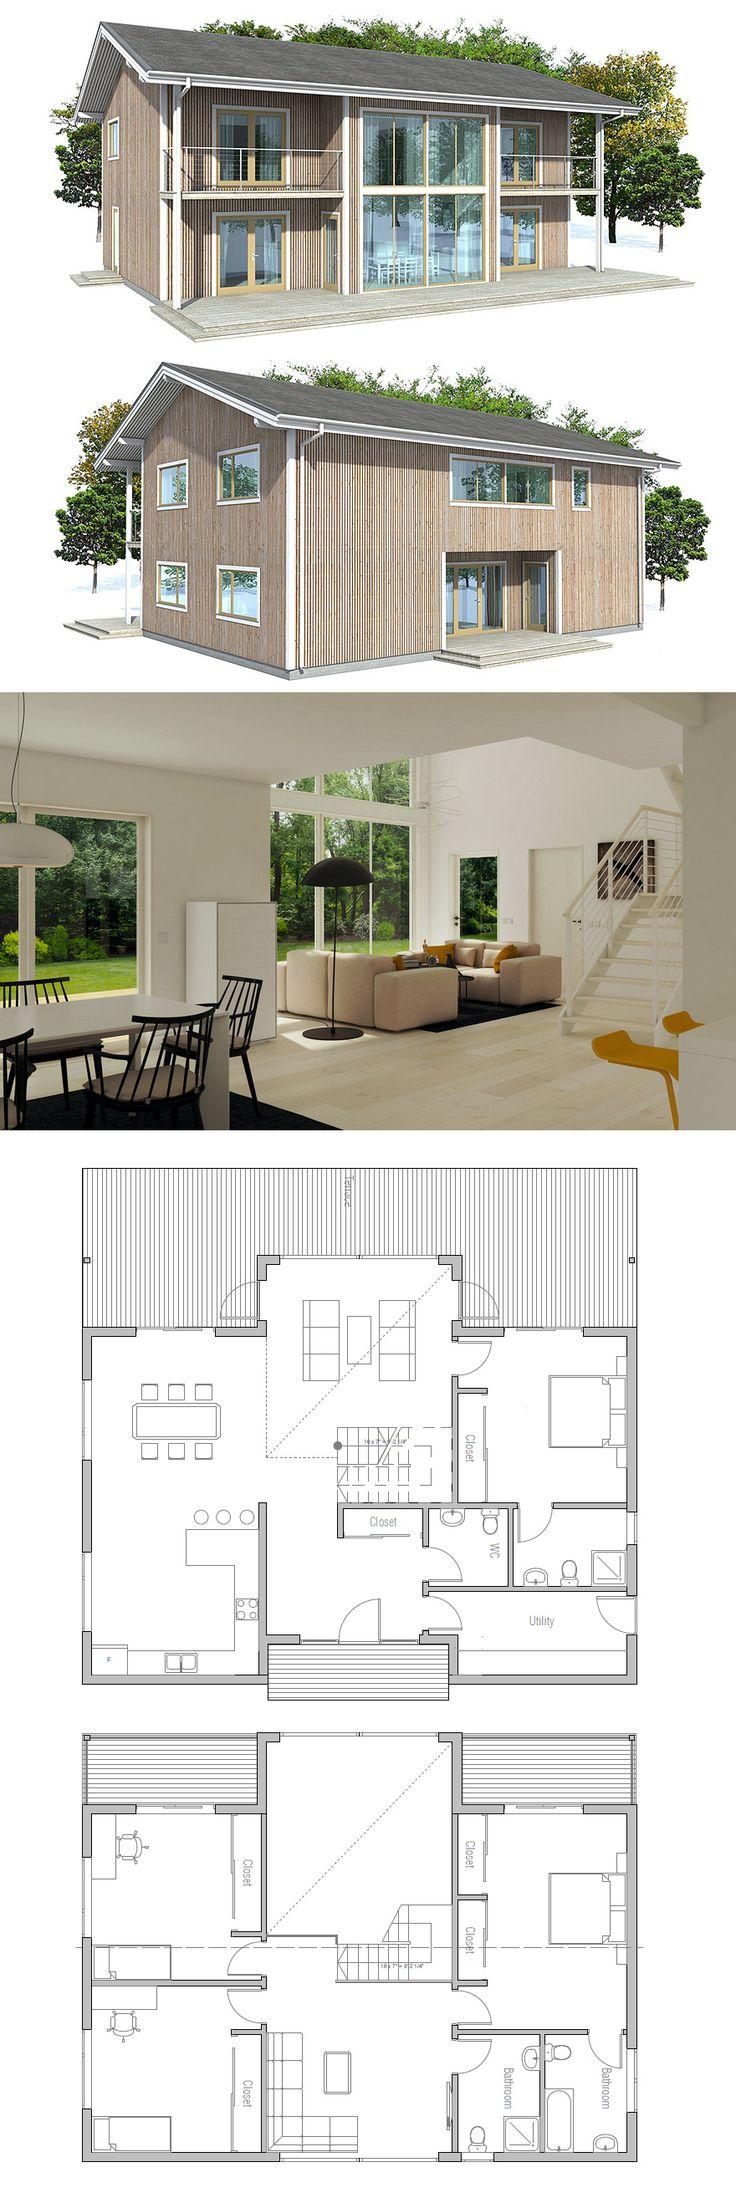 Plan de Maison Small House